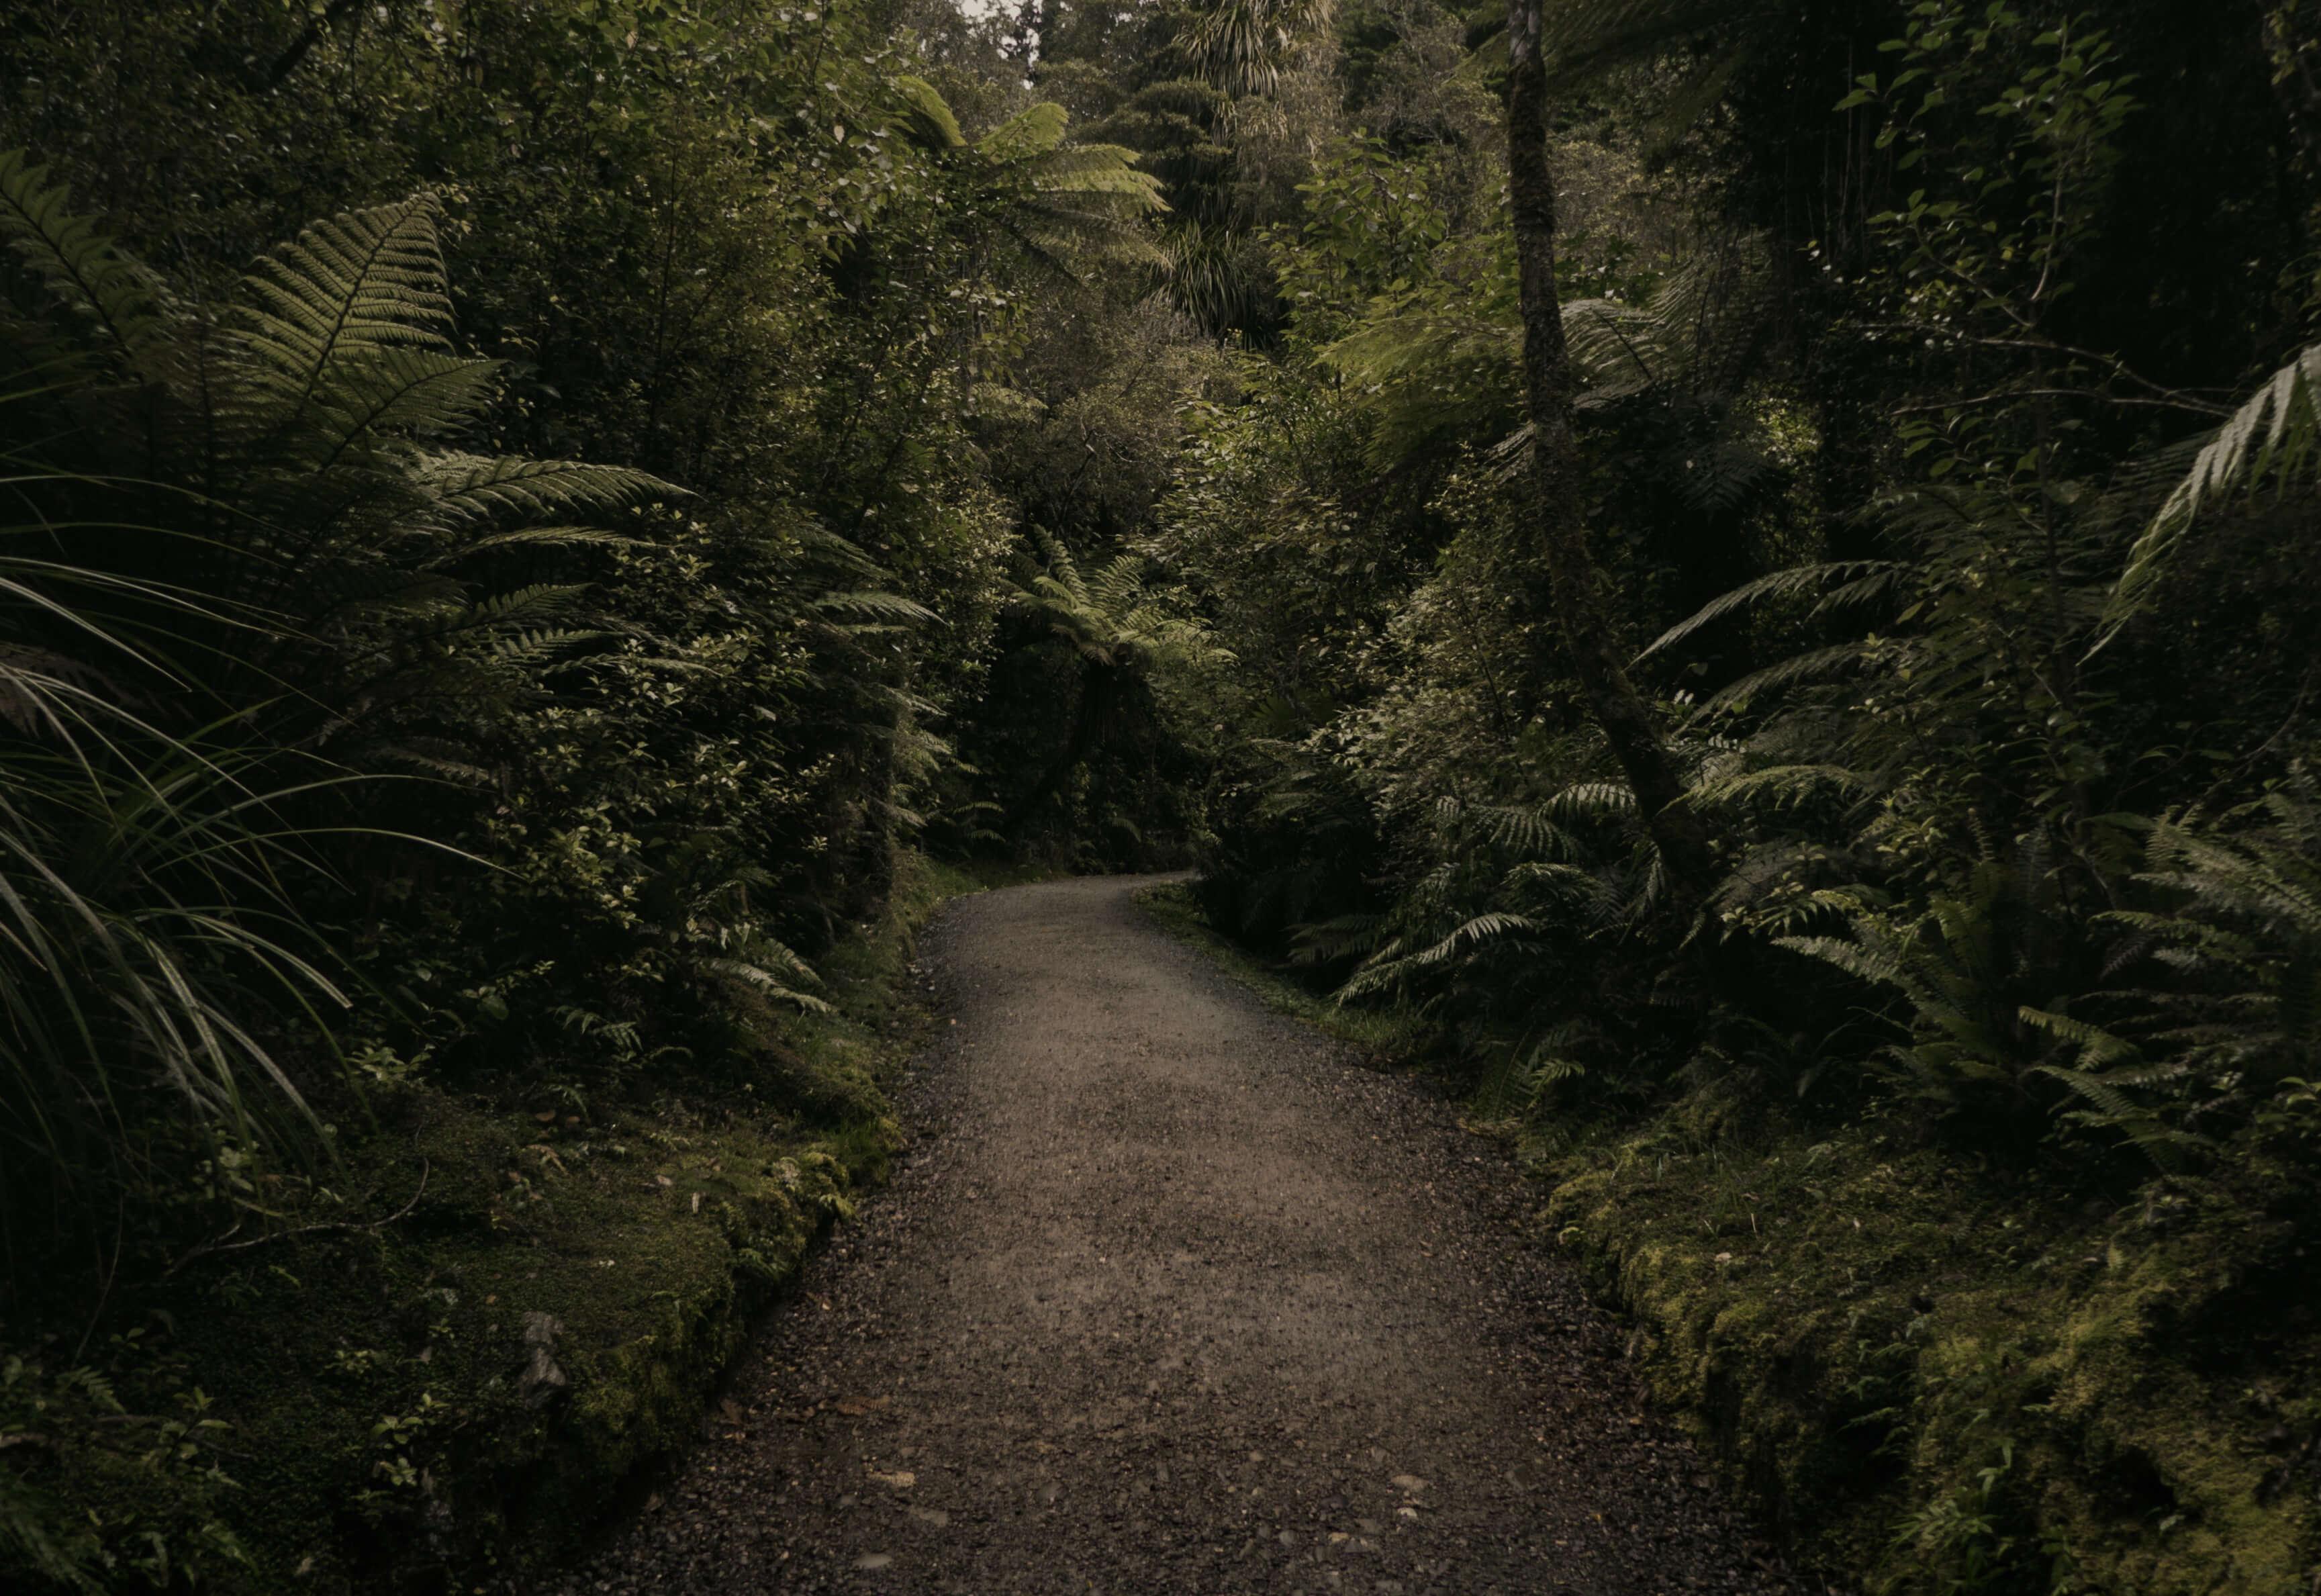 Department of Conservation - Anita Perkins